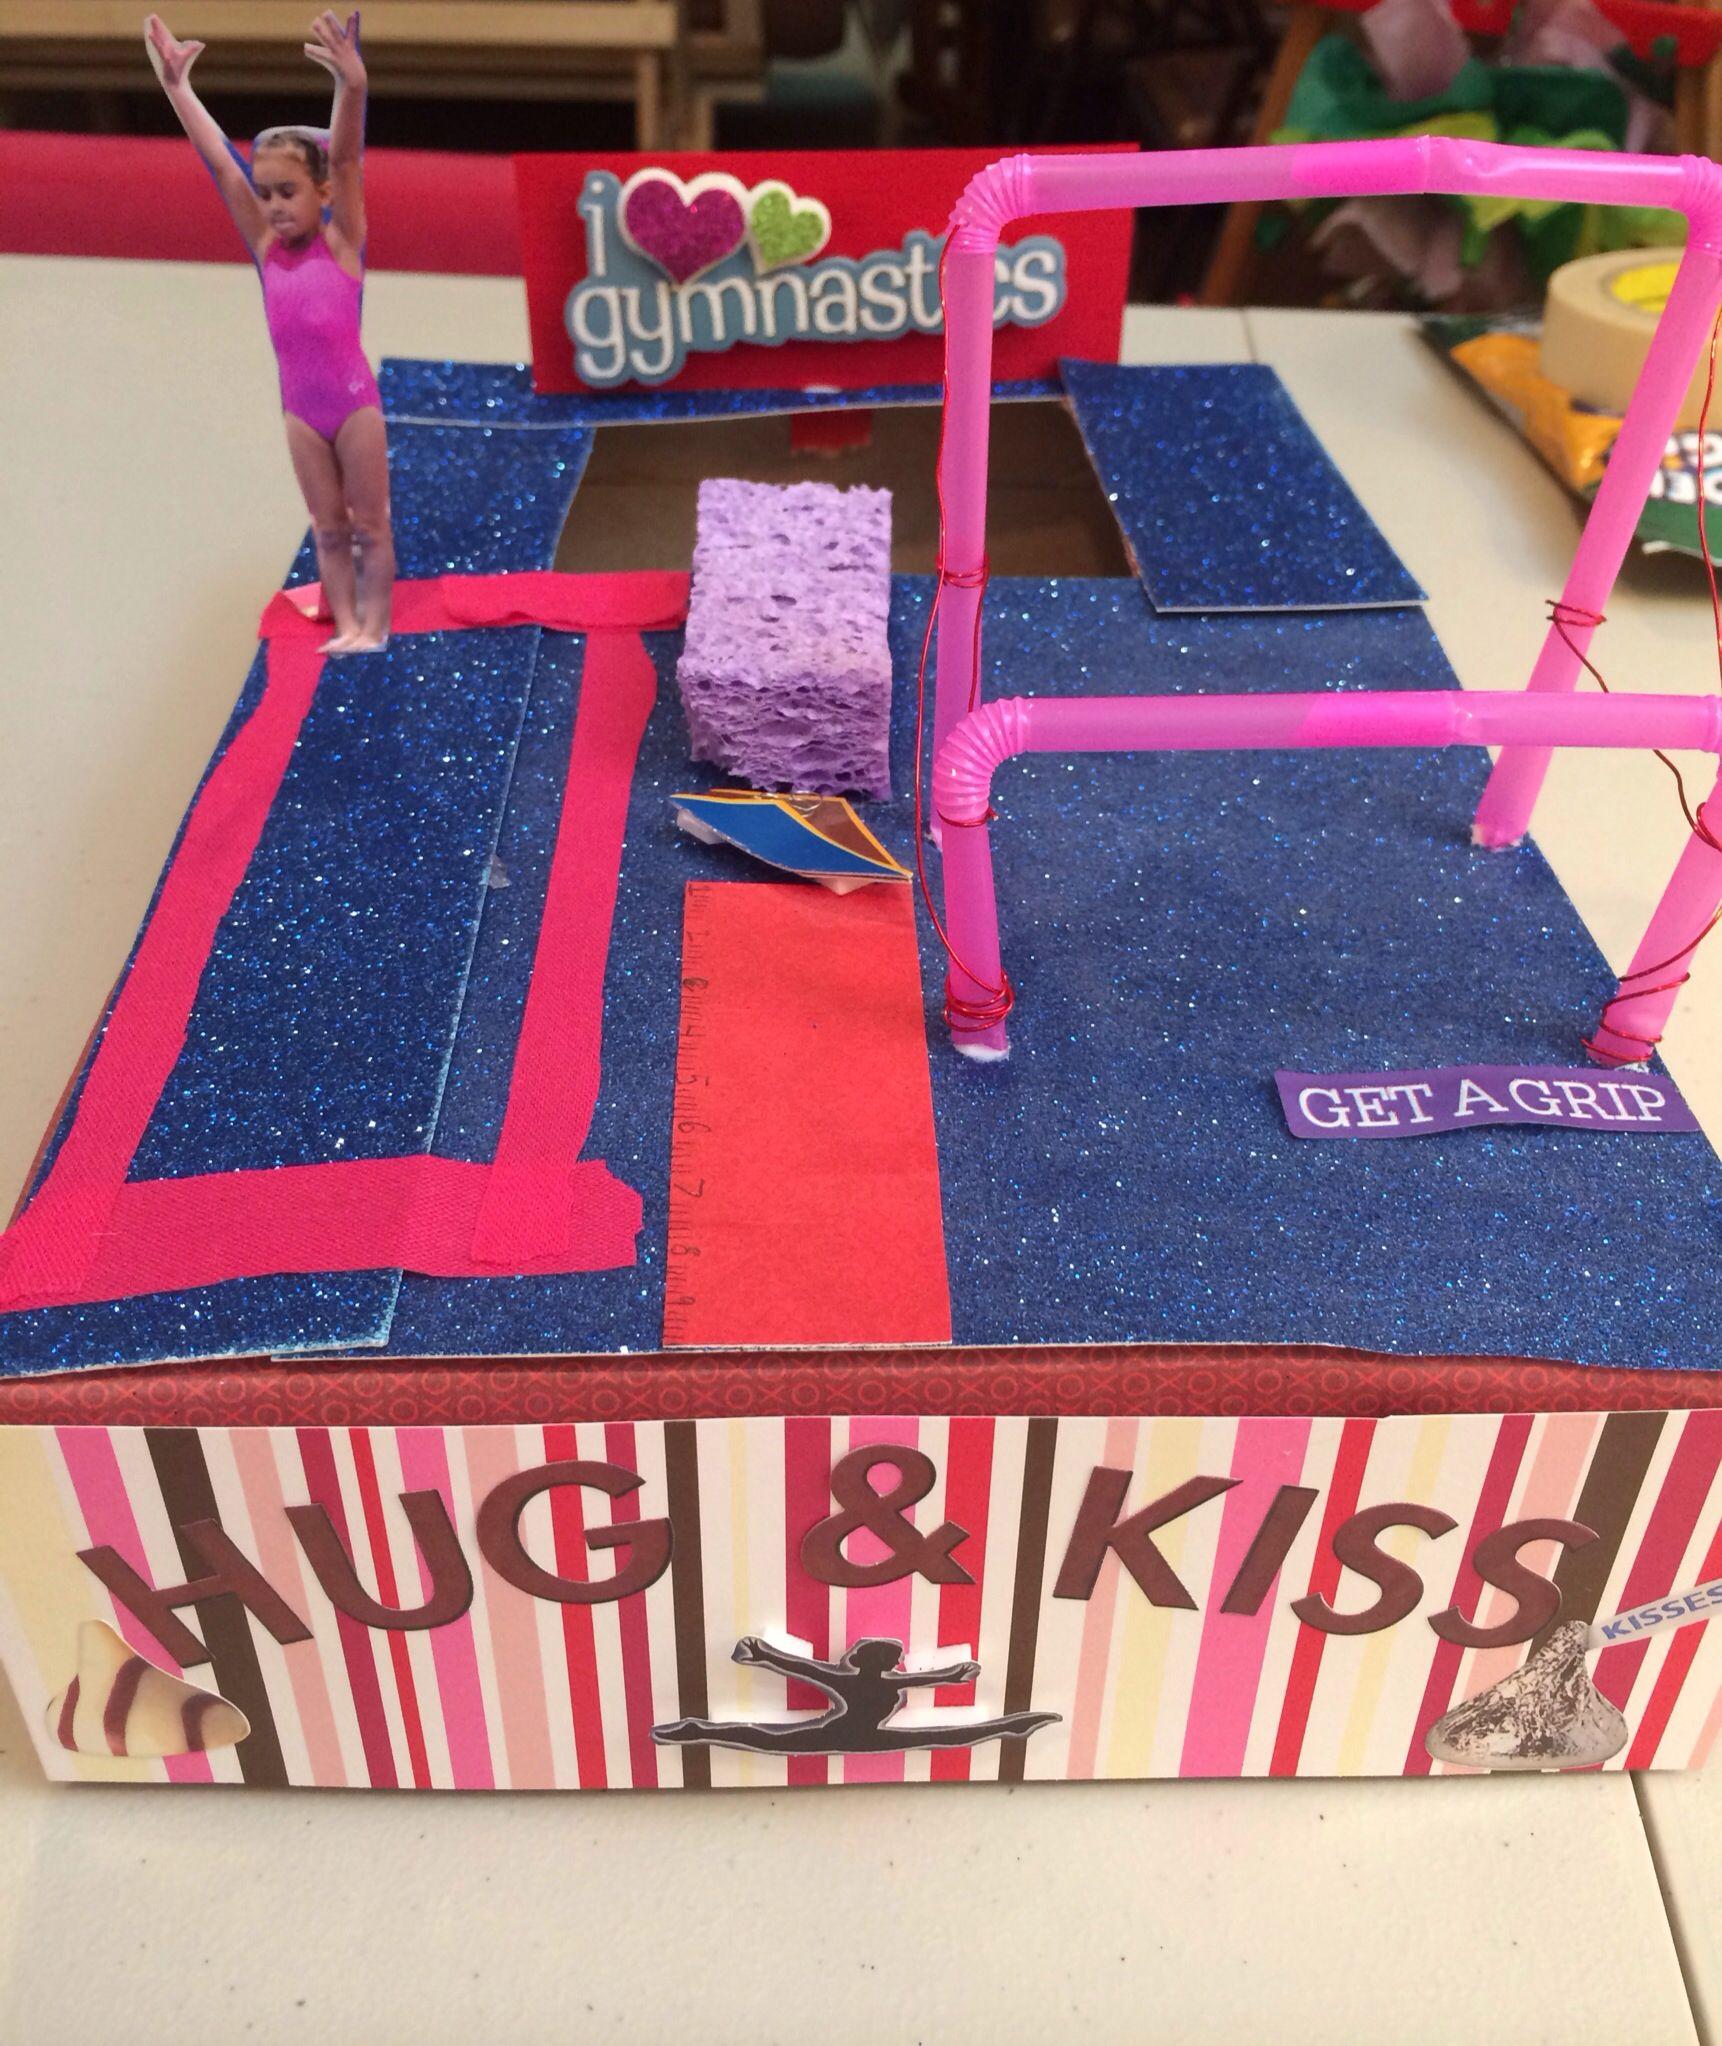 25 Valentine Boxes For Boys Homemade Valentine Boxes Boys Valentines Boxes Kids Valentine Boxes